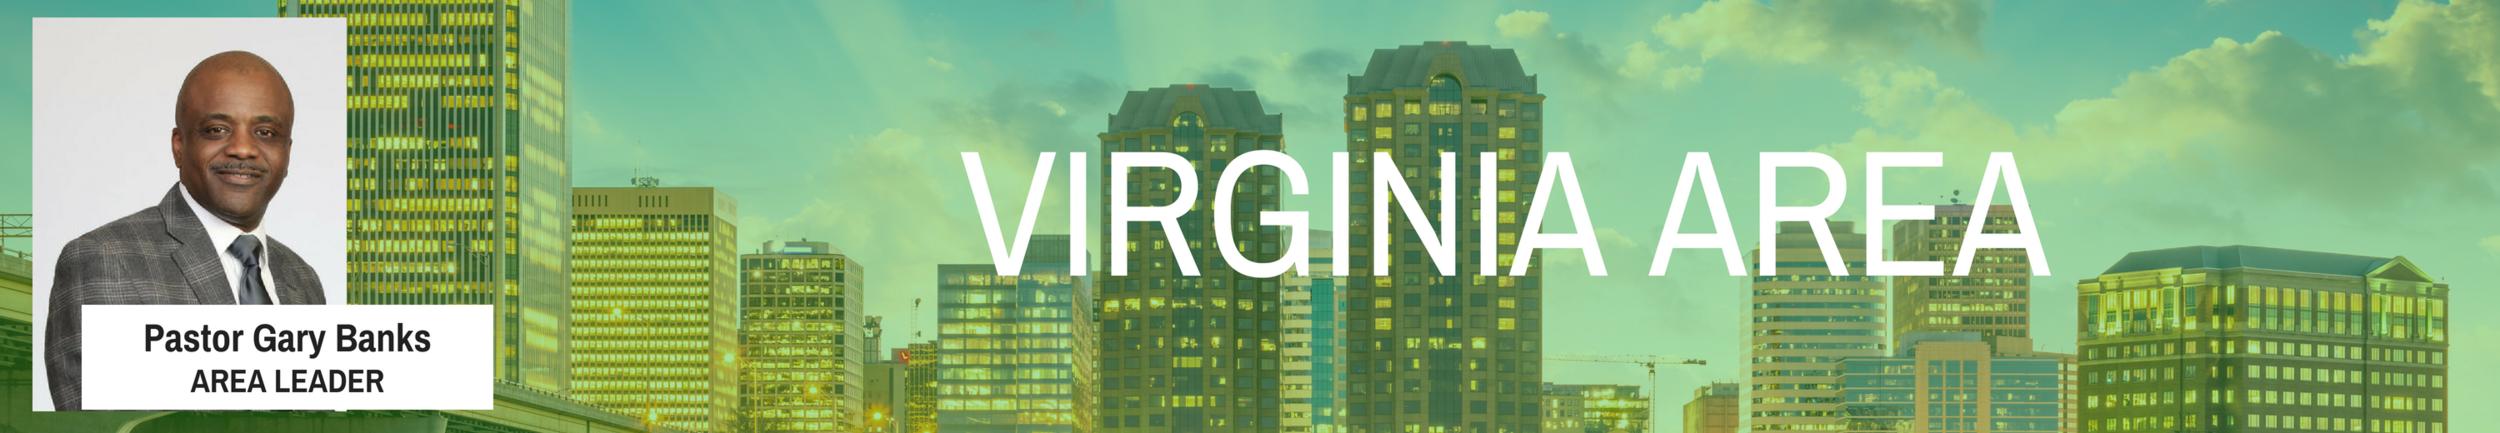 virginiabanner